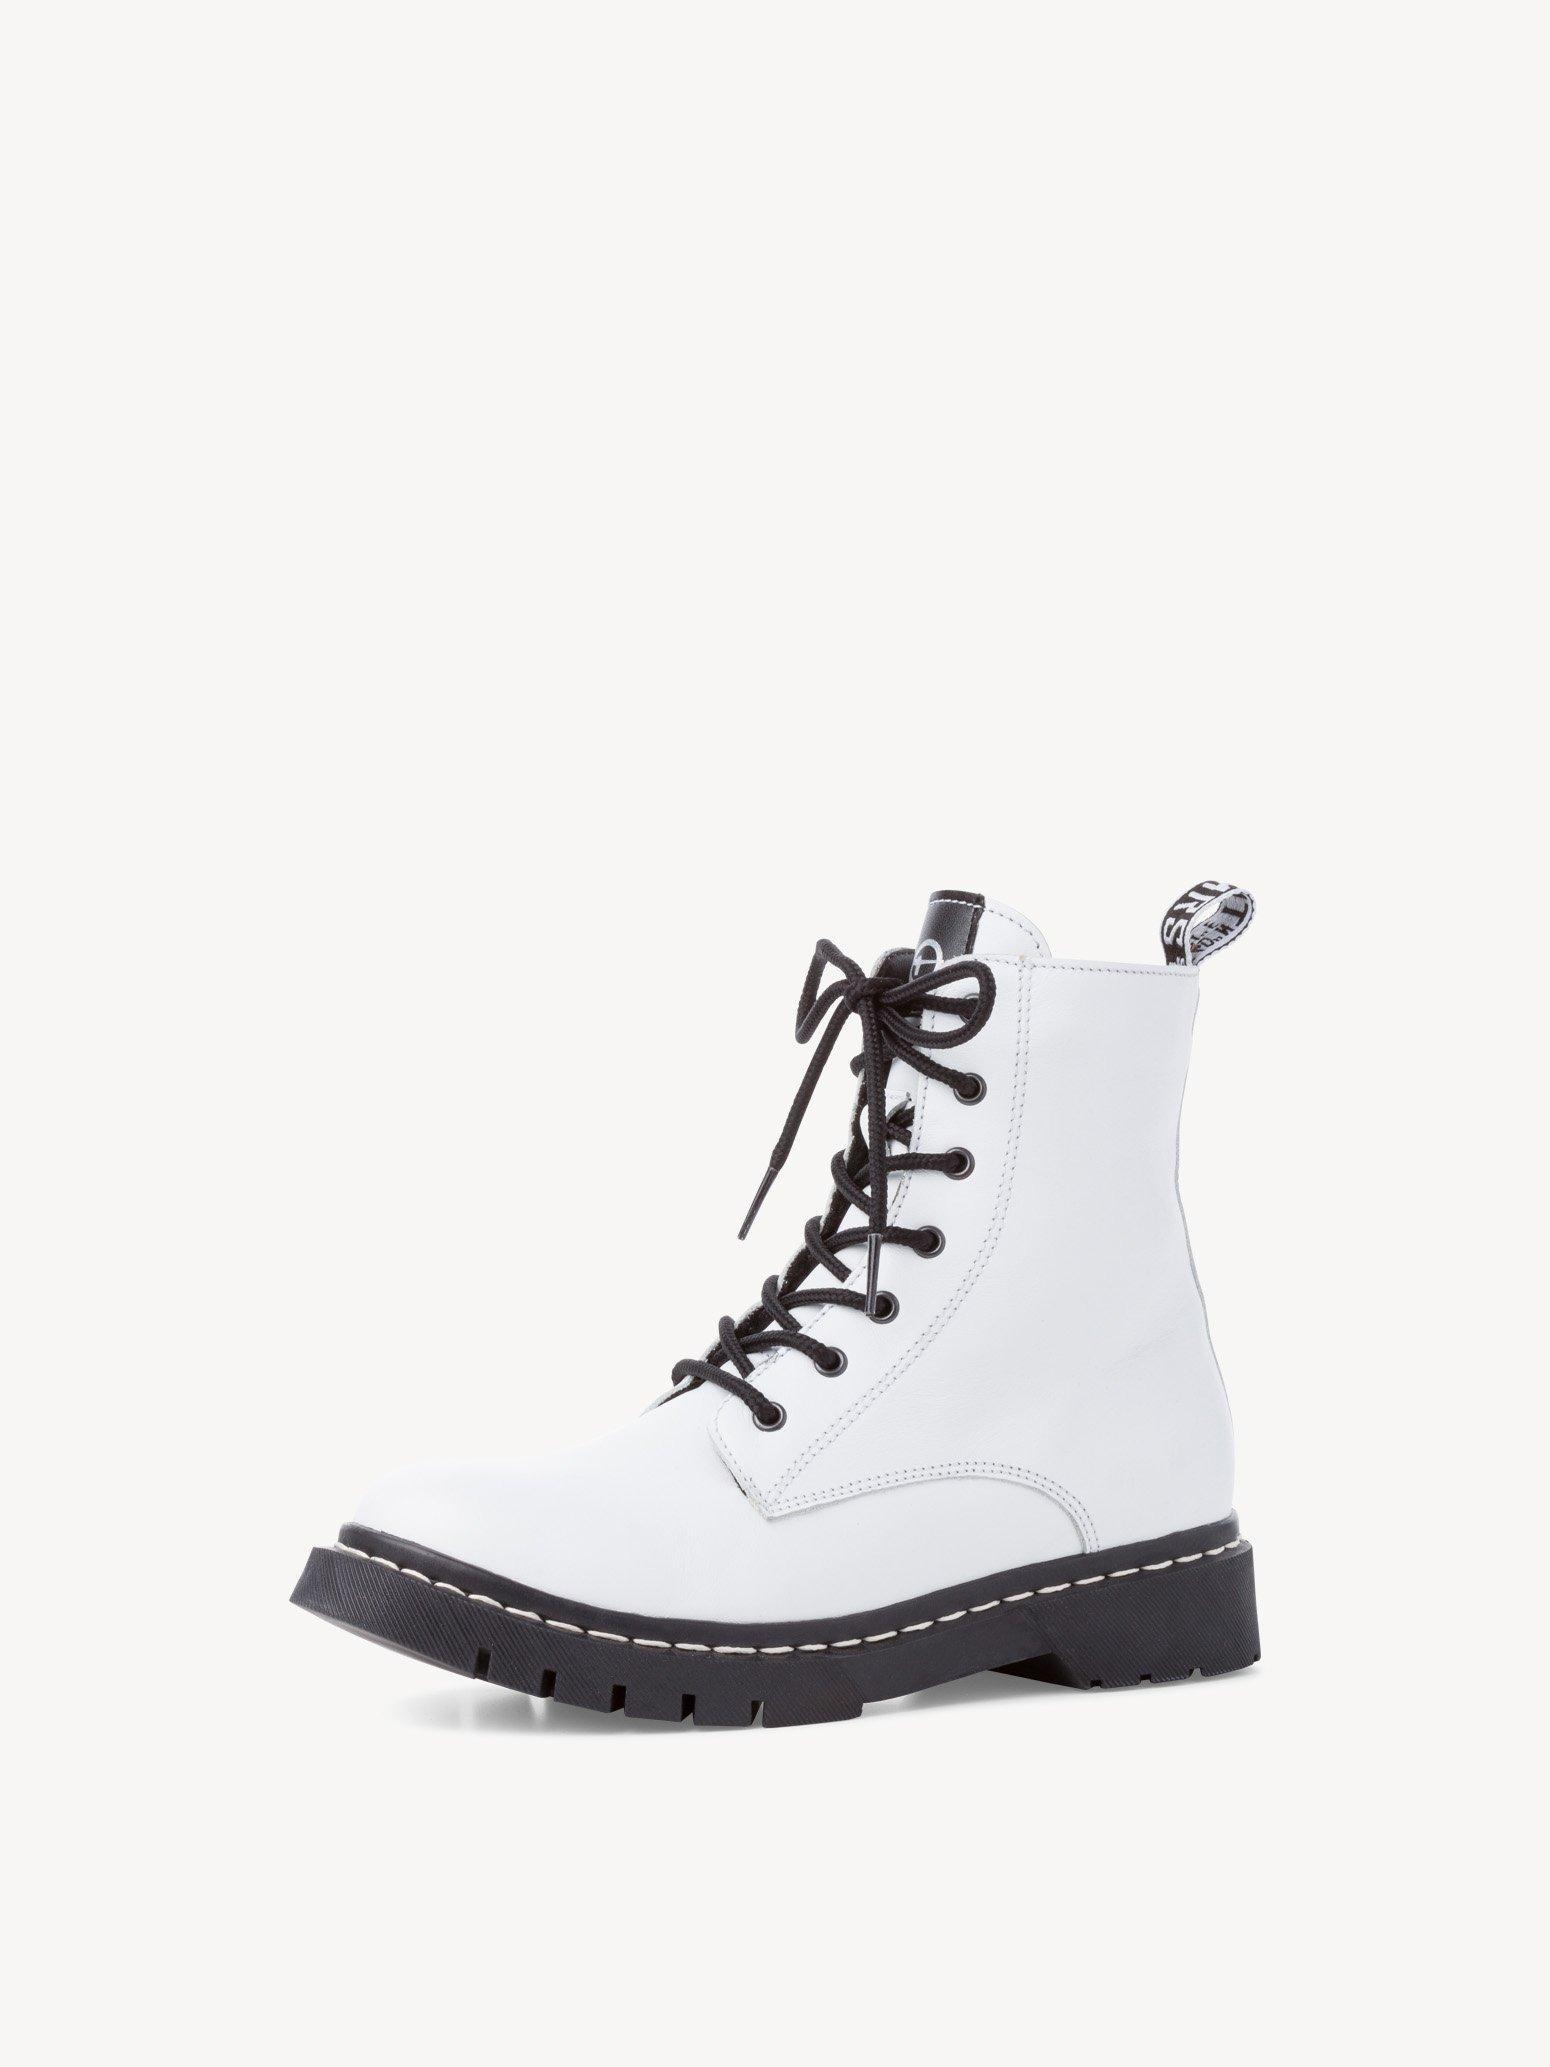 Ботинки Tamaris 1-1-26269-27-100